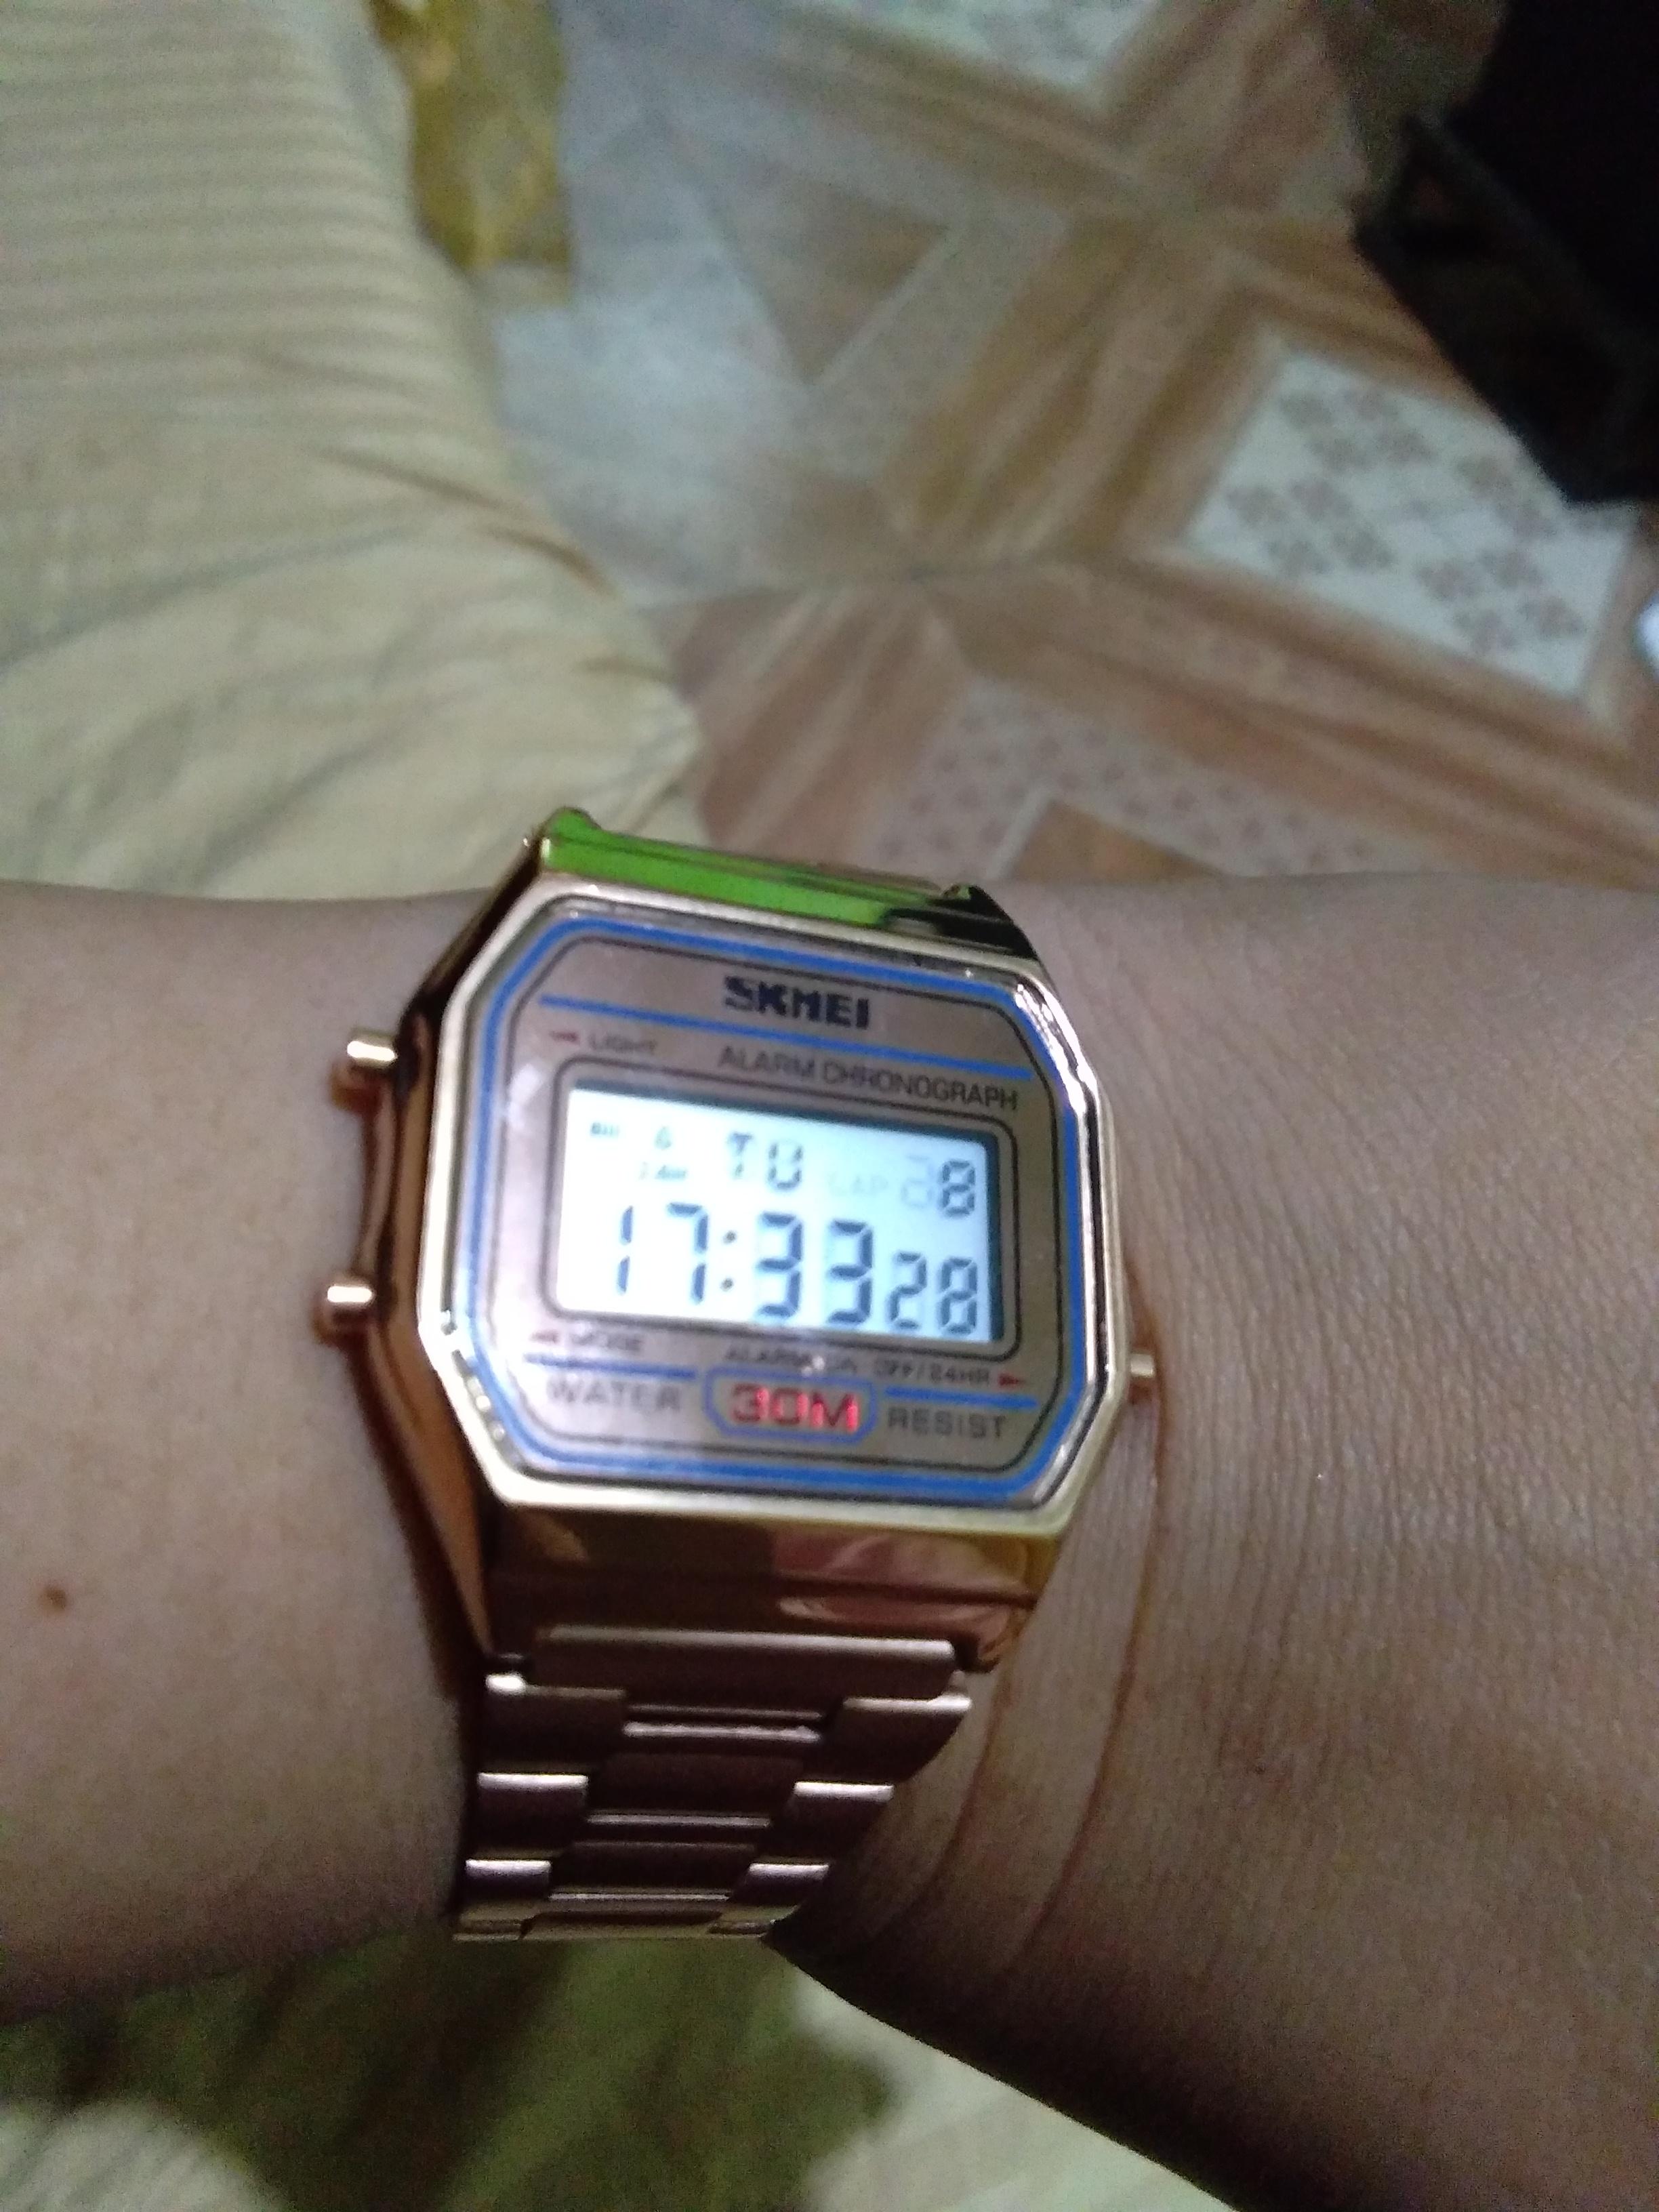 b9e1982a3d0 Skmei Stainless Steel Unisex Watch 1123 (Rose Gold)